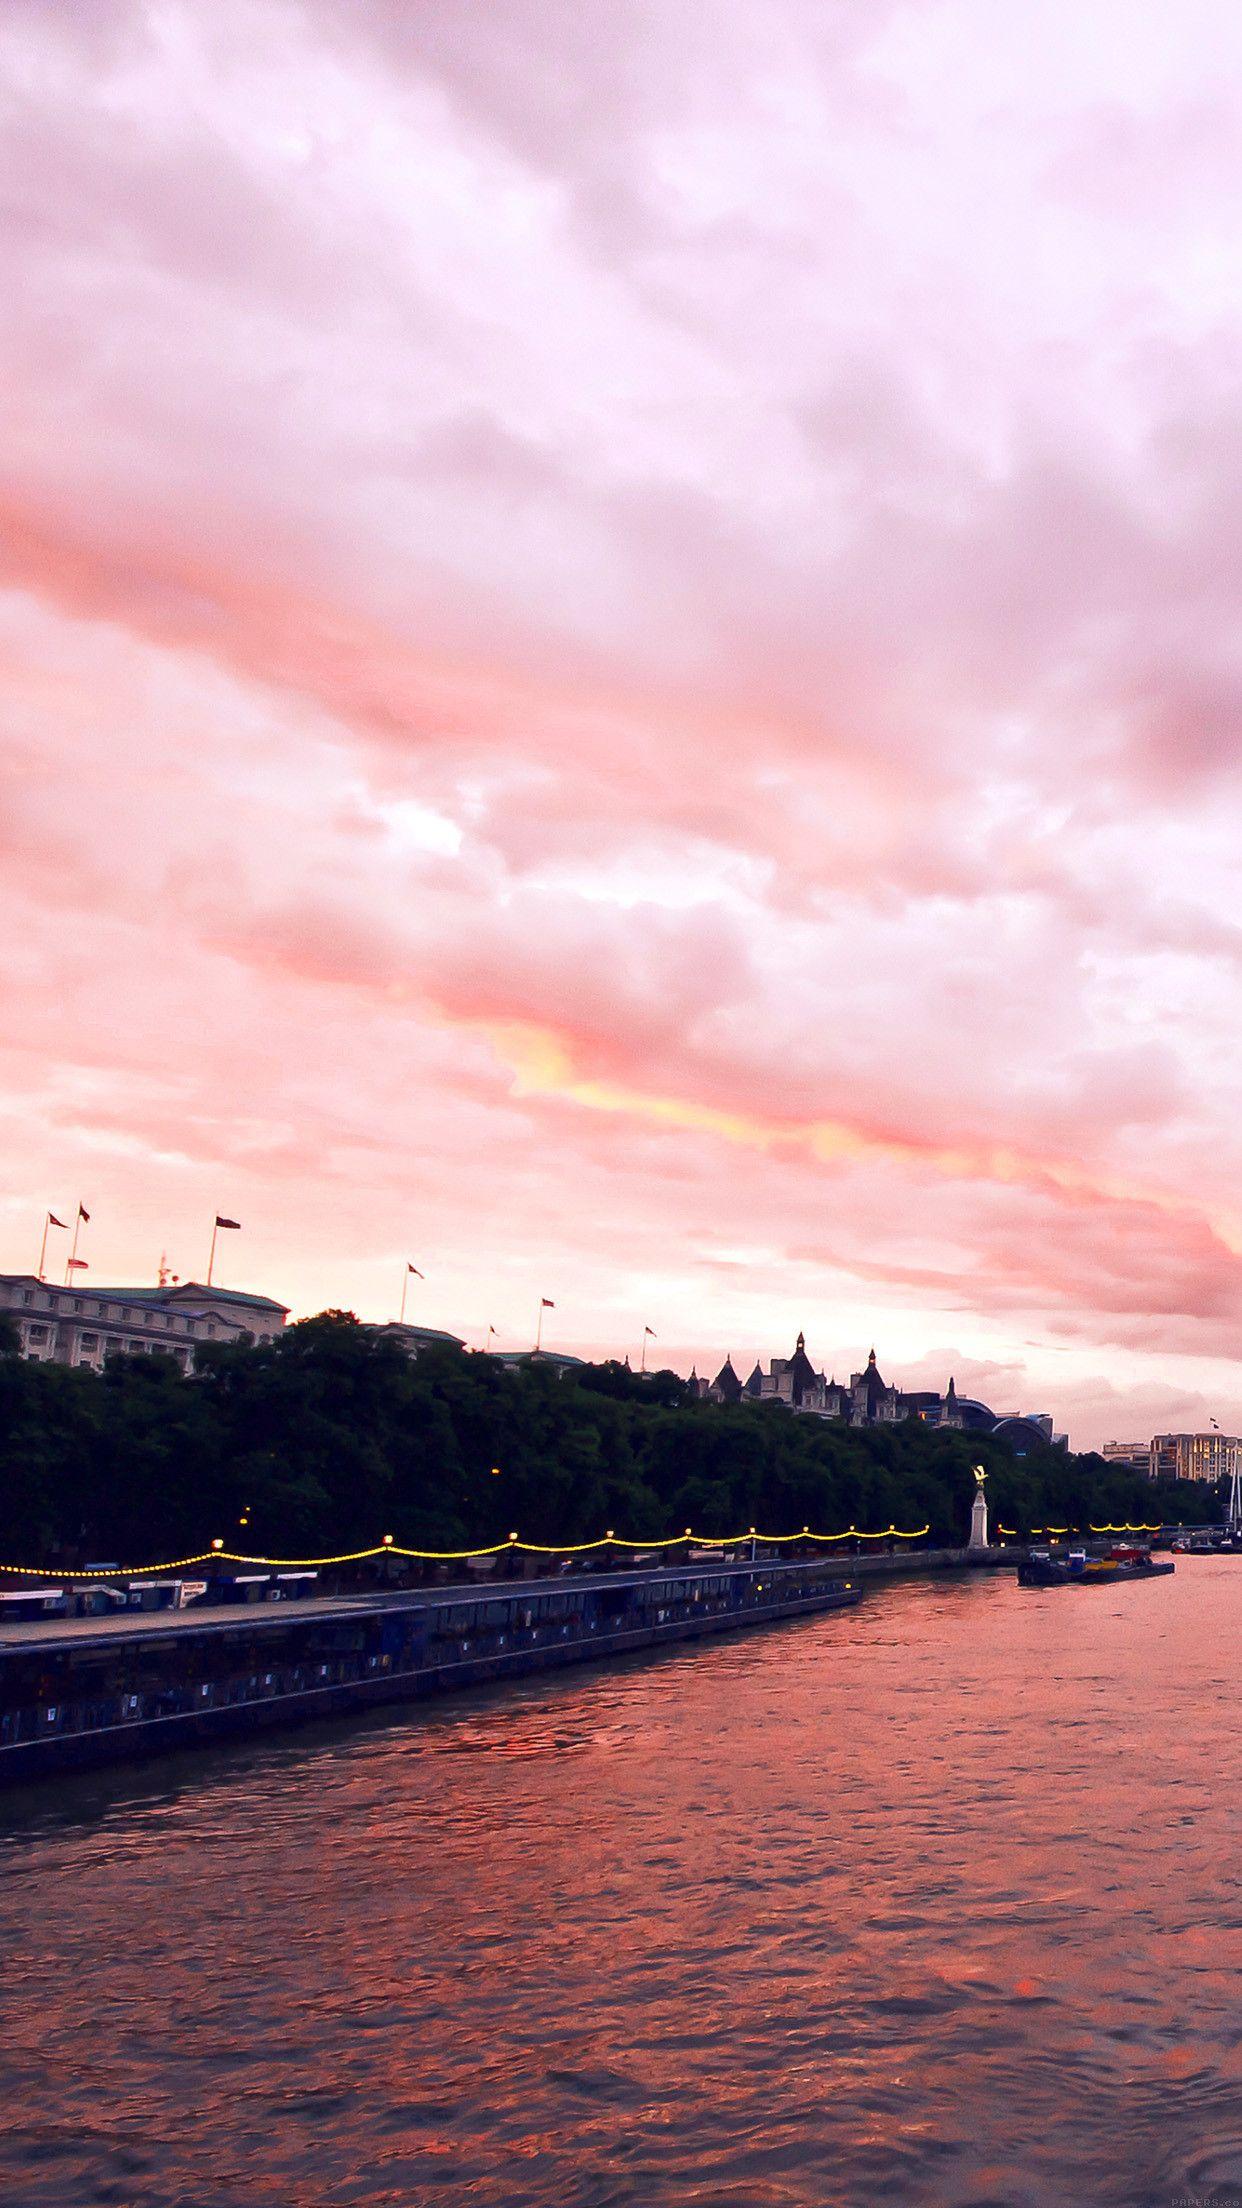 Iphone 6s Rose Gold Wallpaper Tumblr